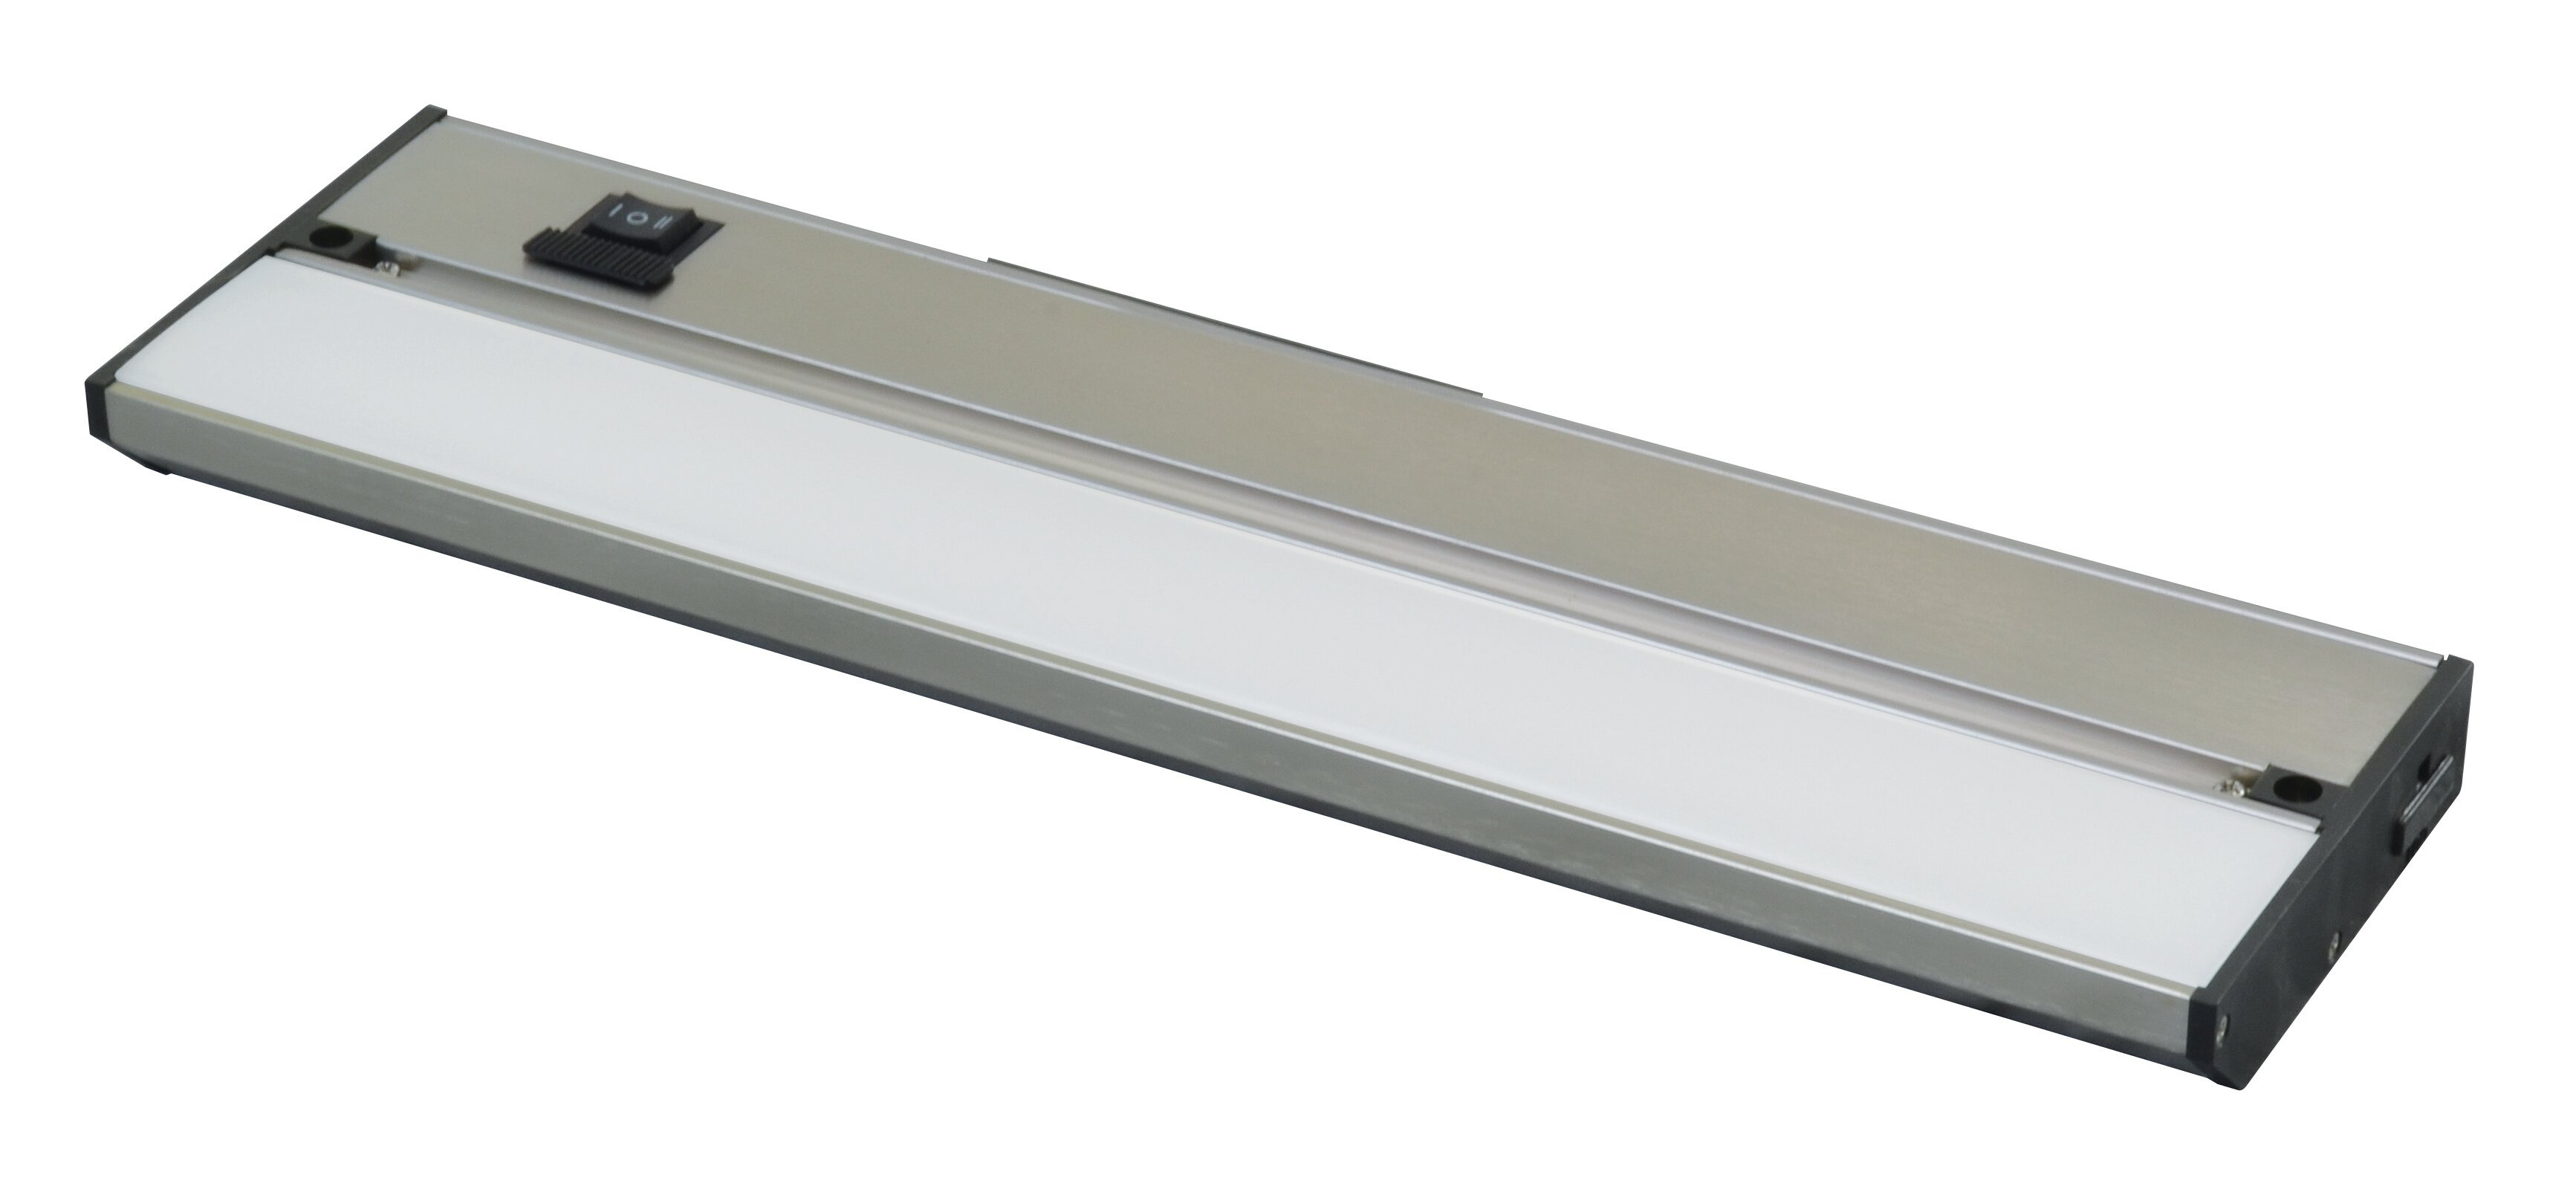 Noble pro led under cabinet bar light